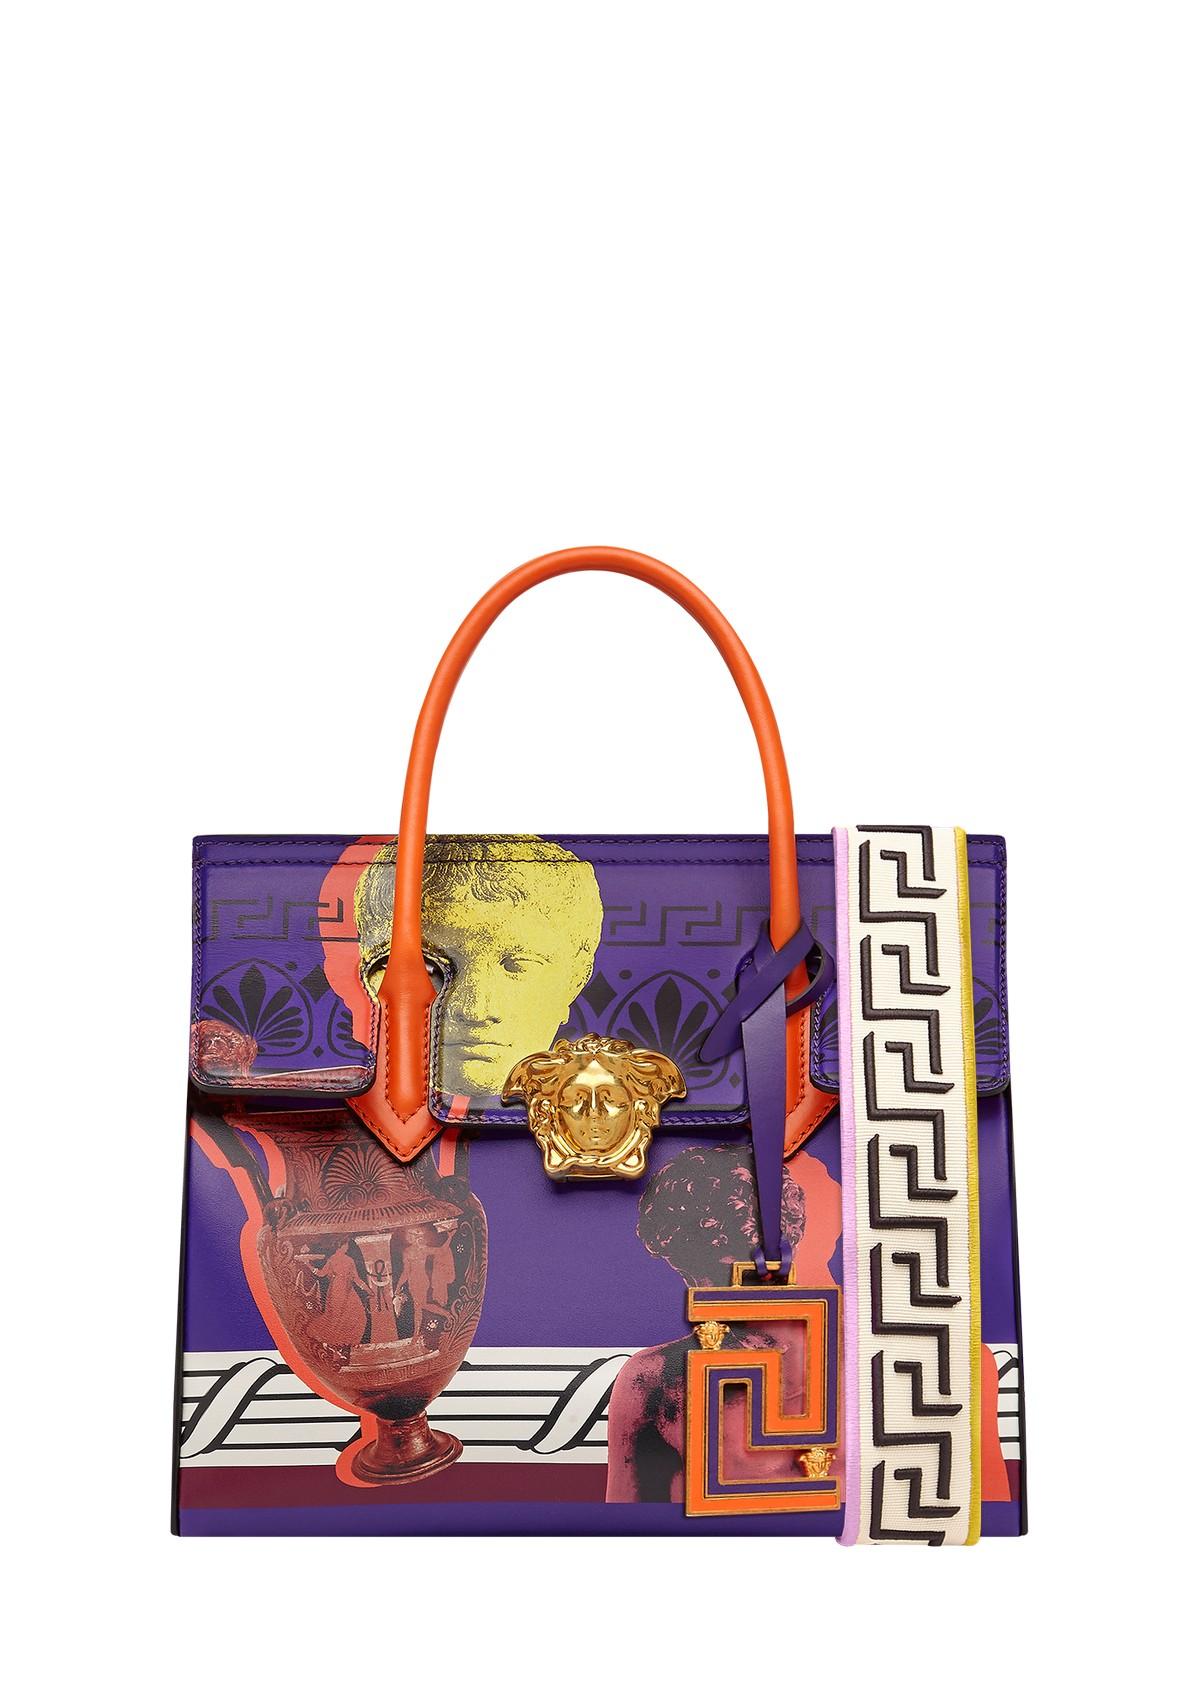 Versace borsa Palazzo Empire 2018